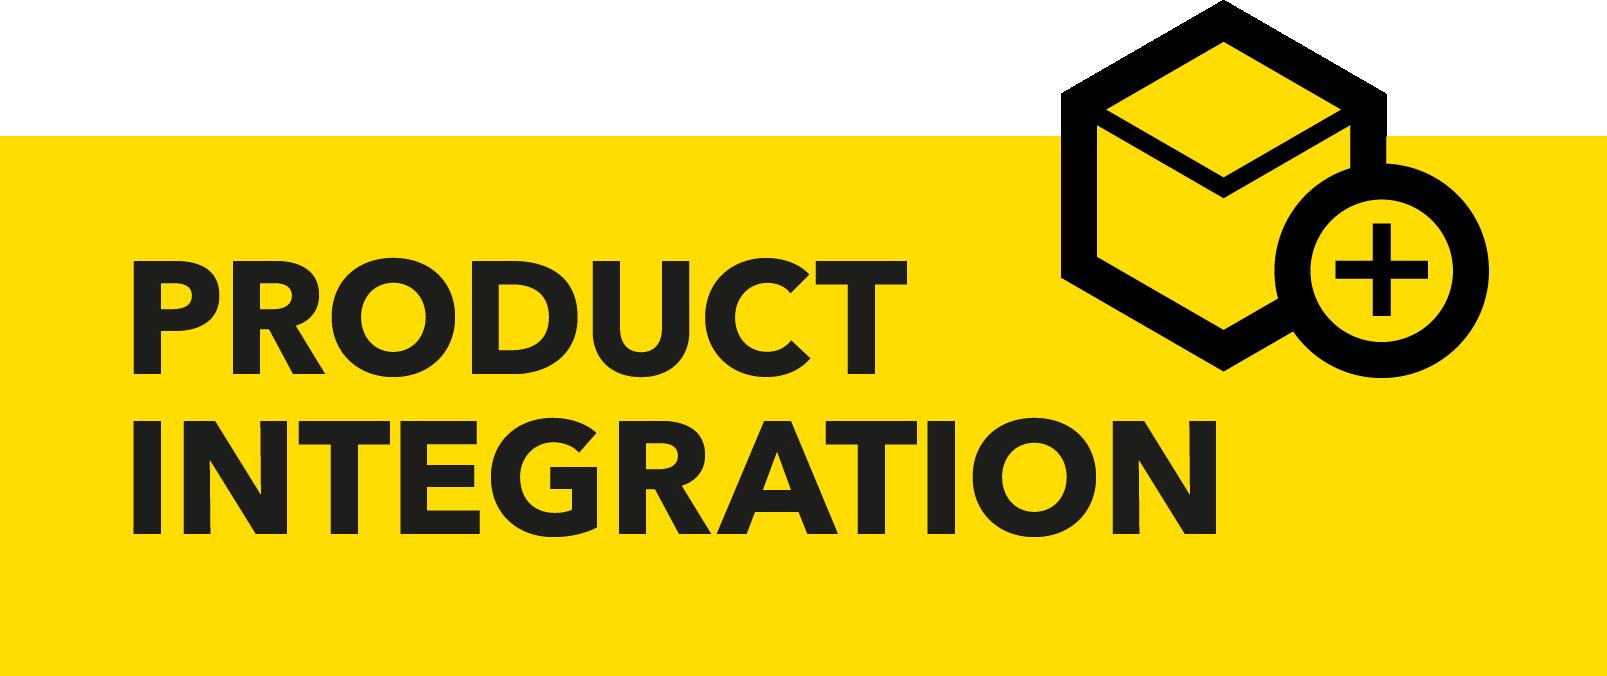 Product Integration